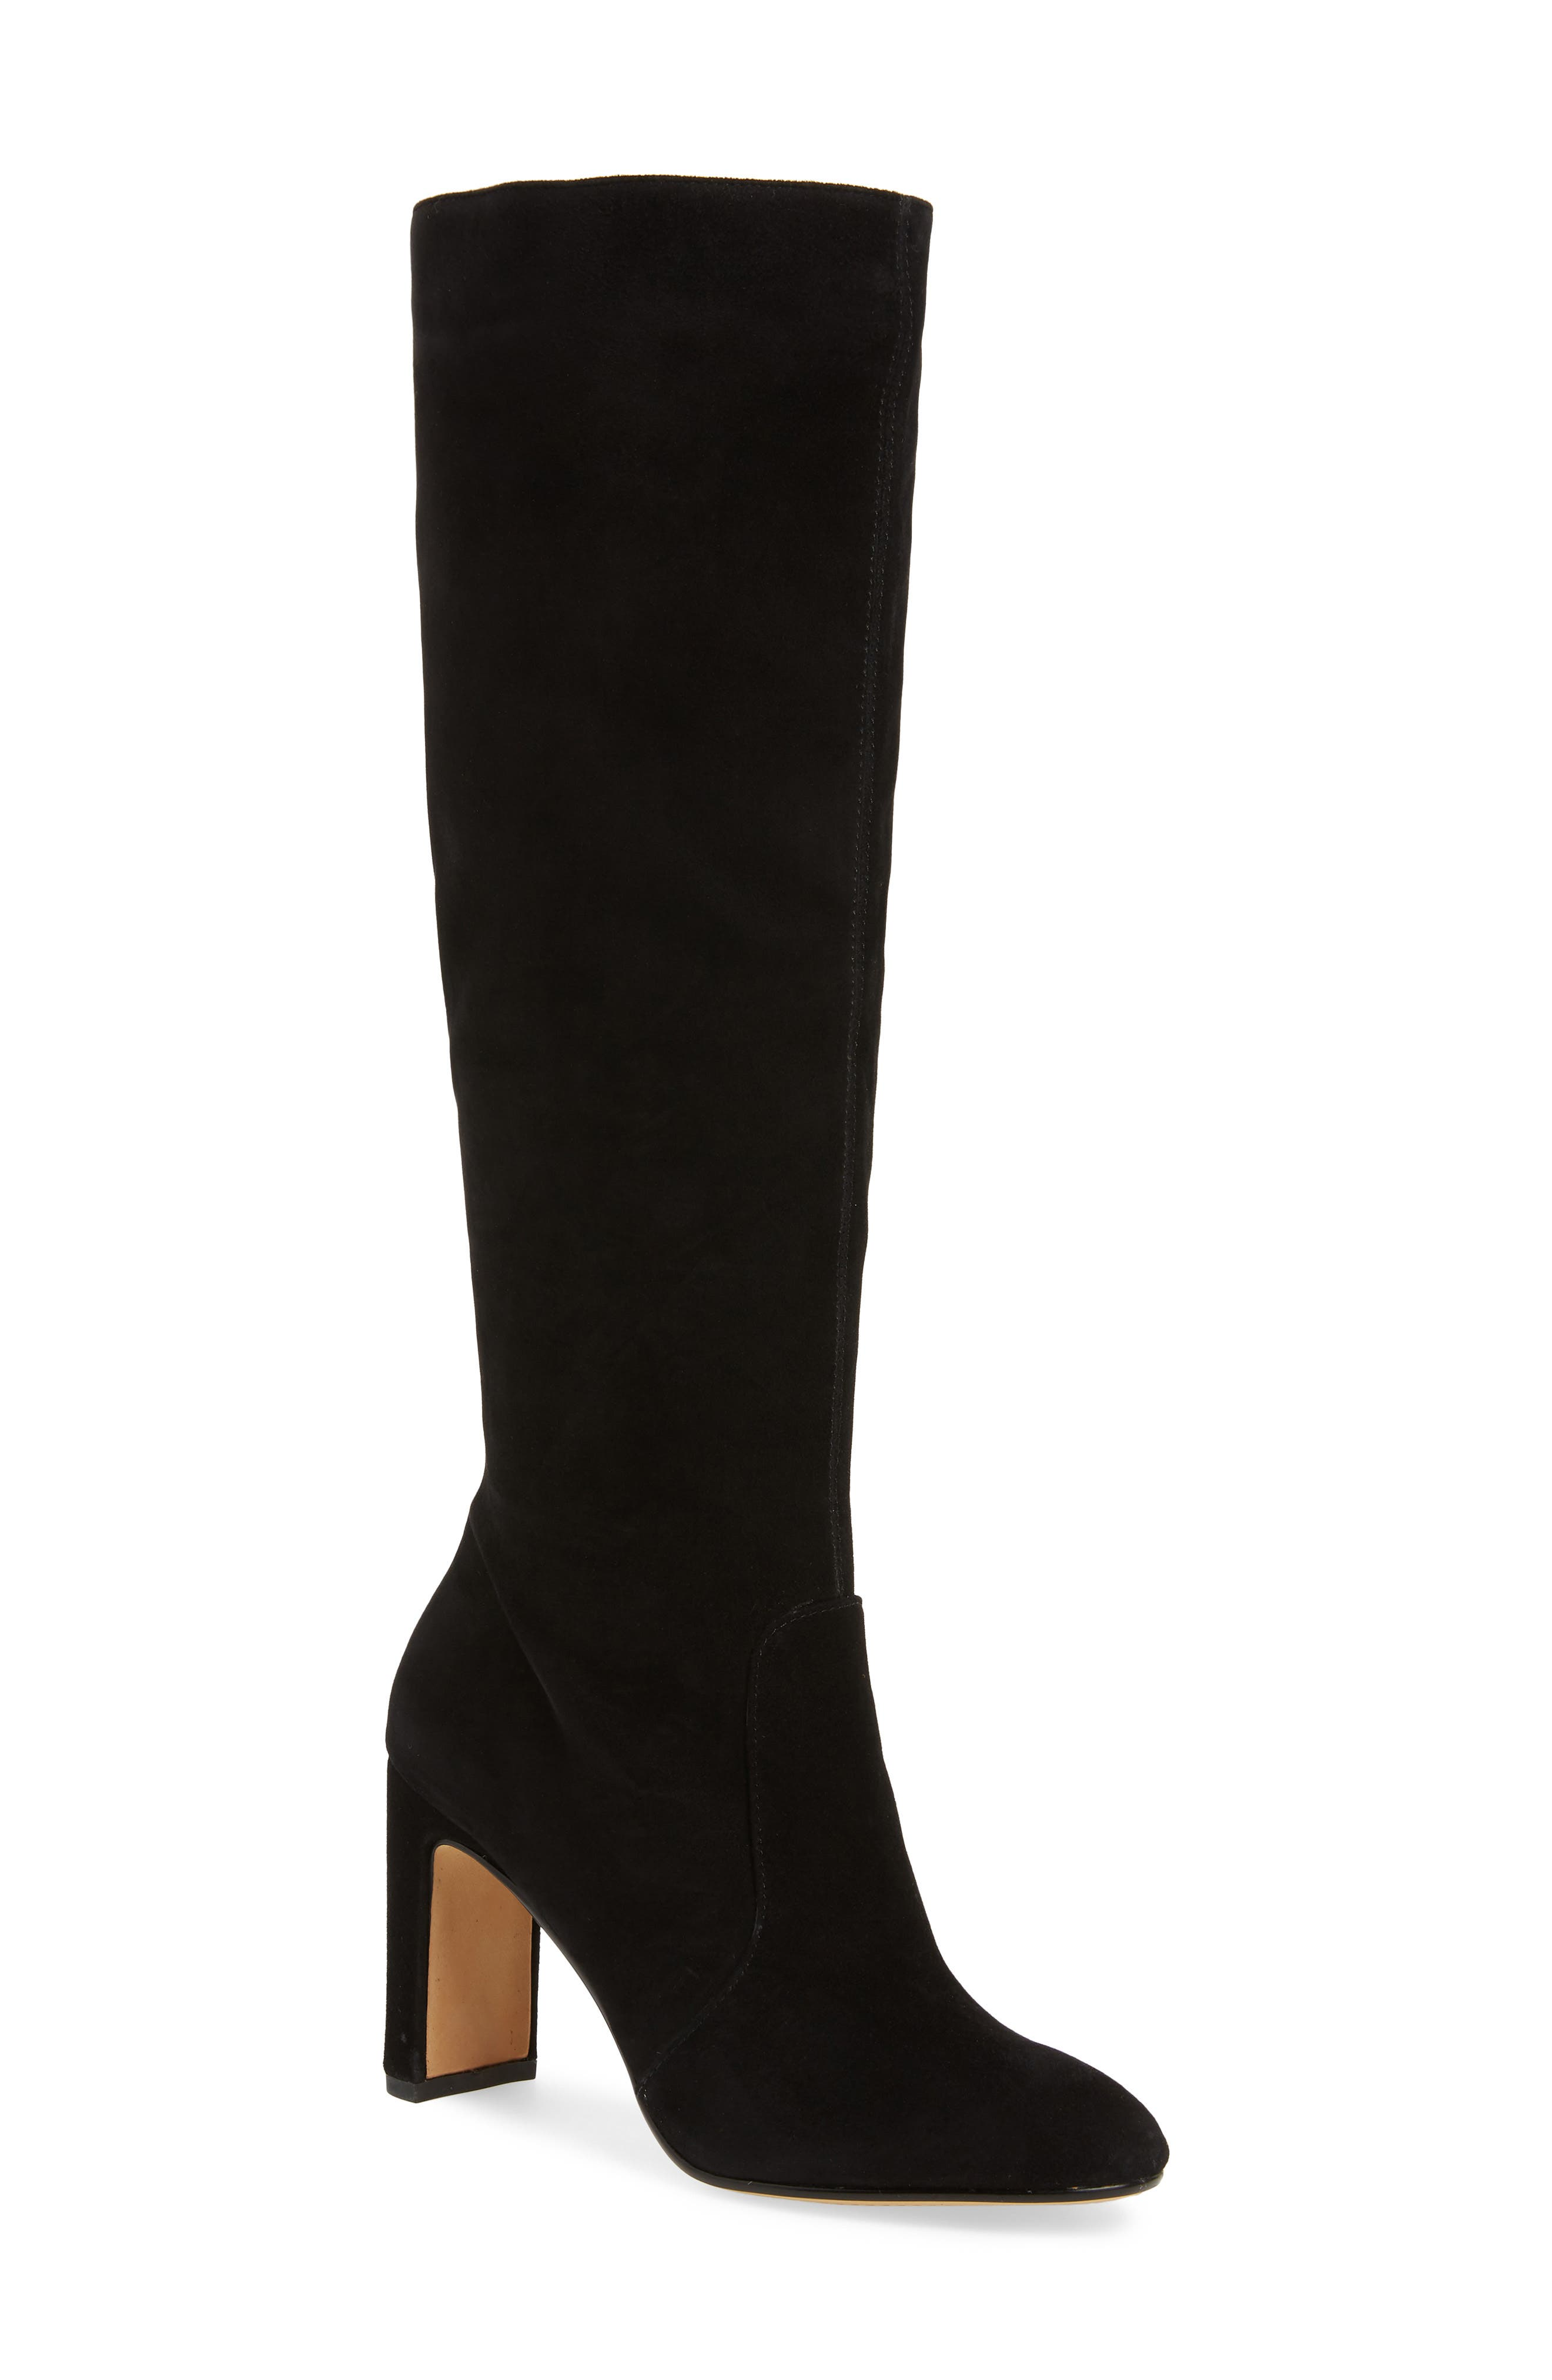 Women Shoes Nordstrom Dolce For Vita 1THSqv for lomea.xyz